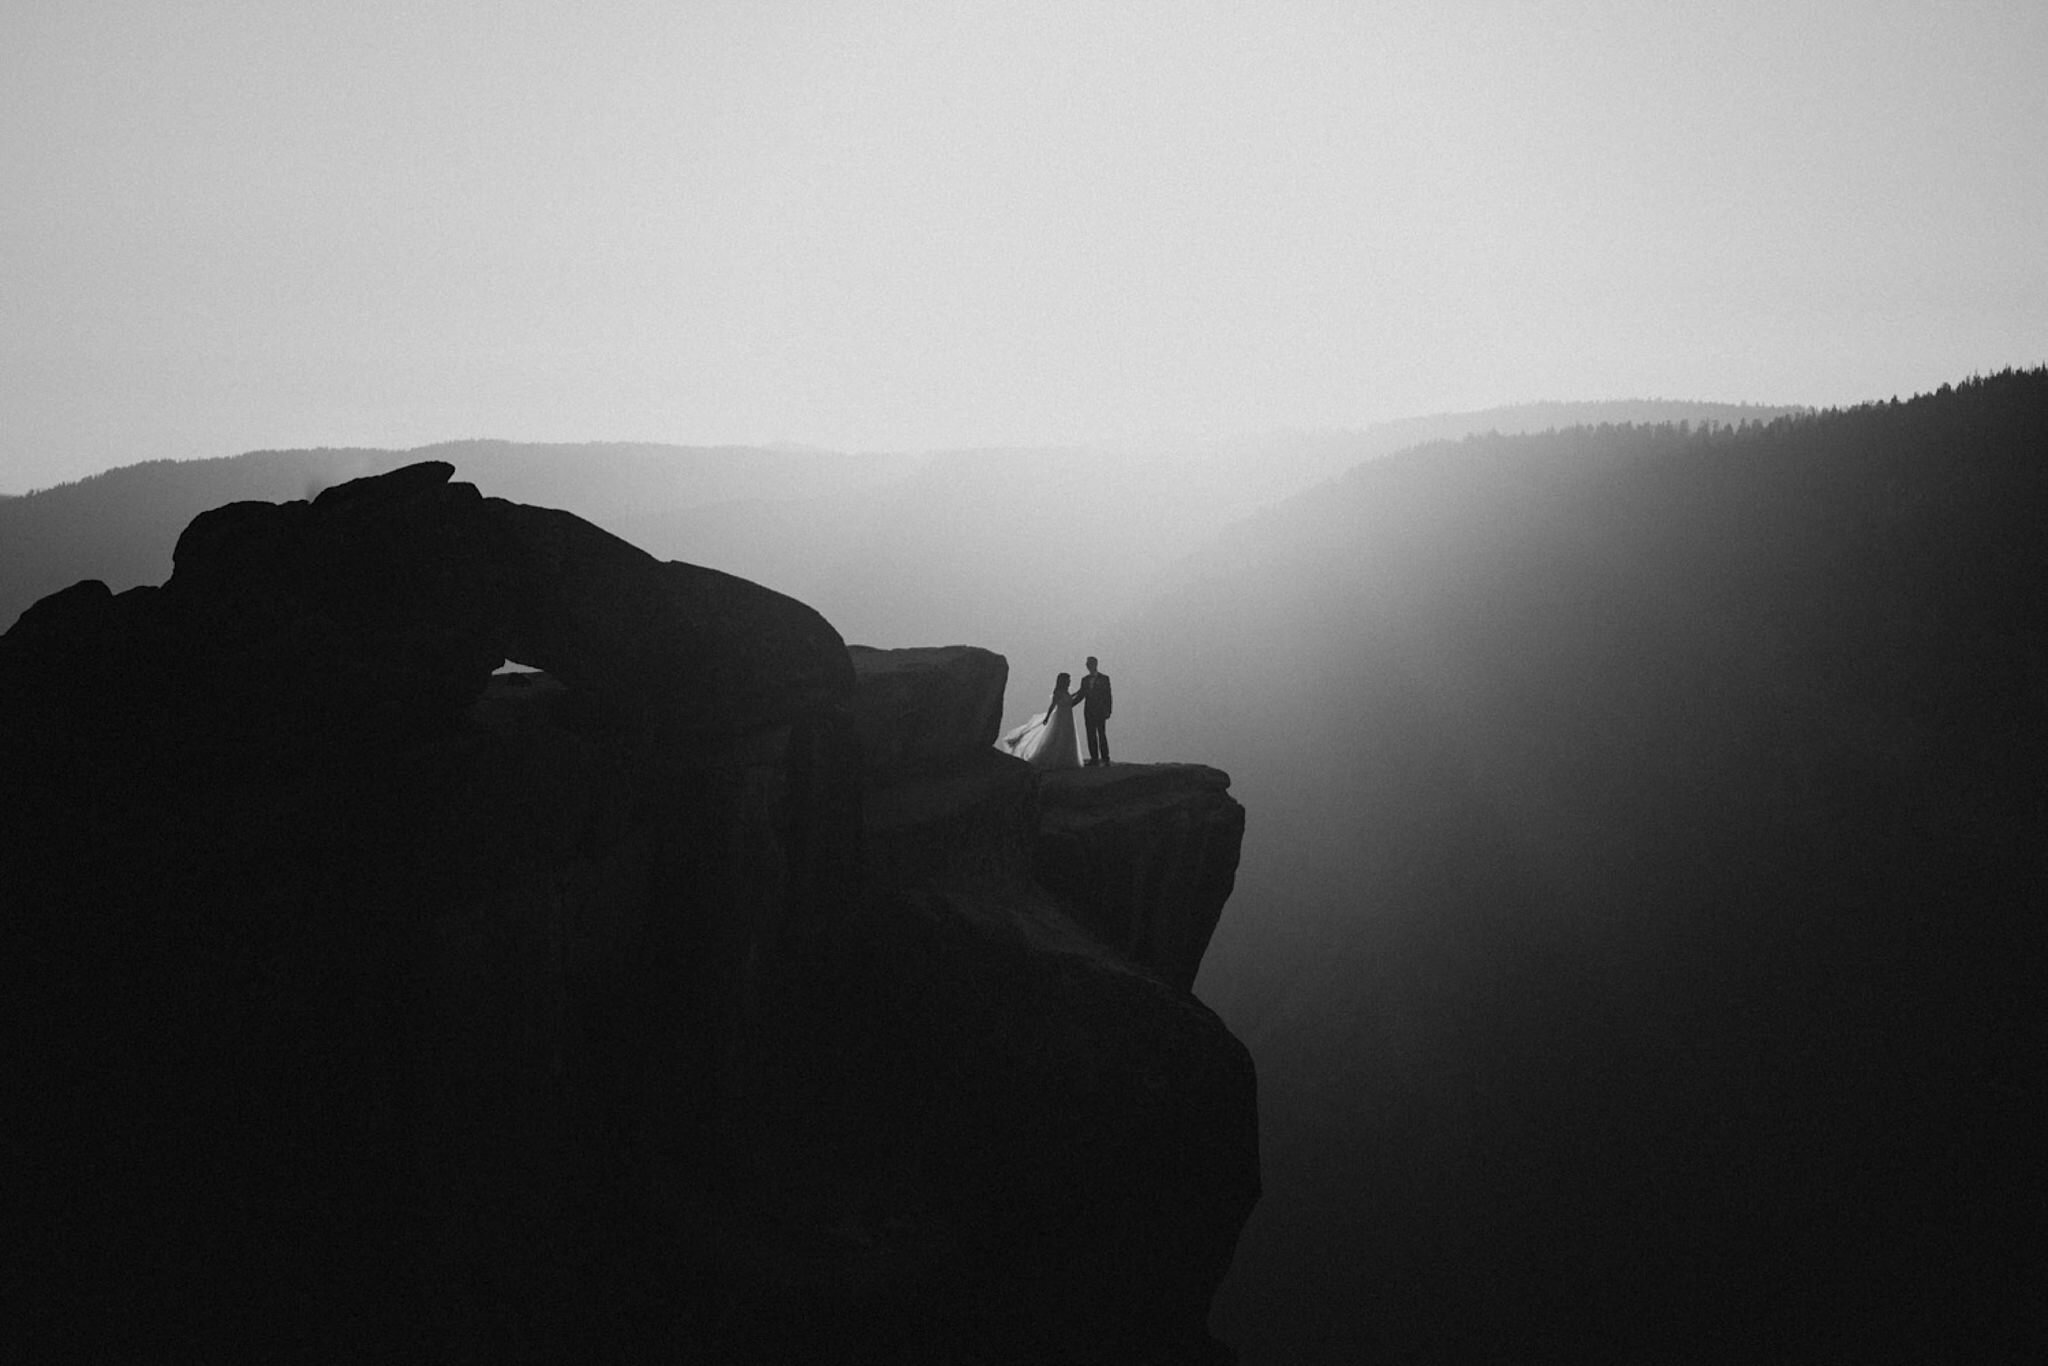 Hanging rock at Yosemite National Park wedding and elopement